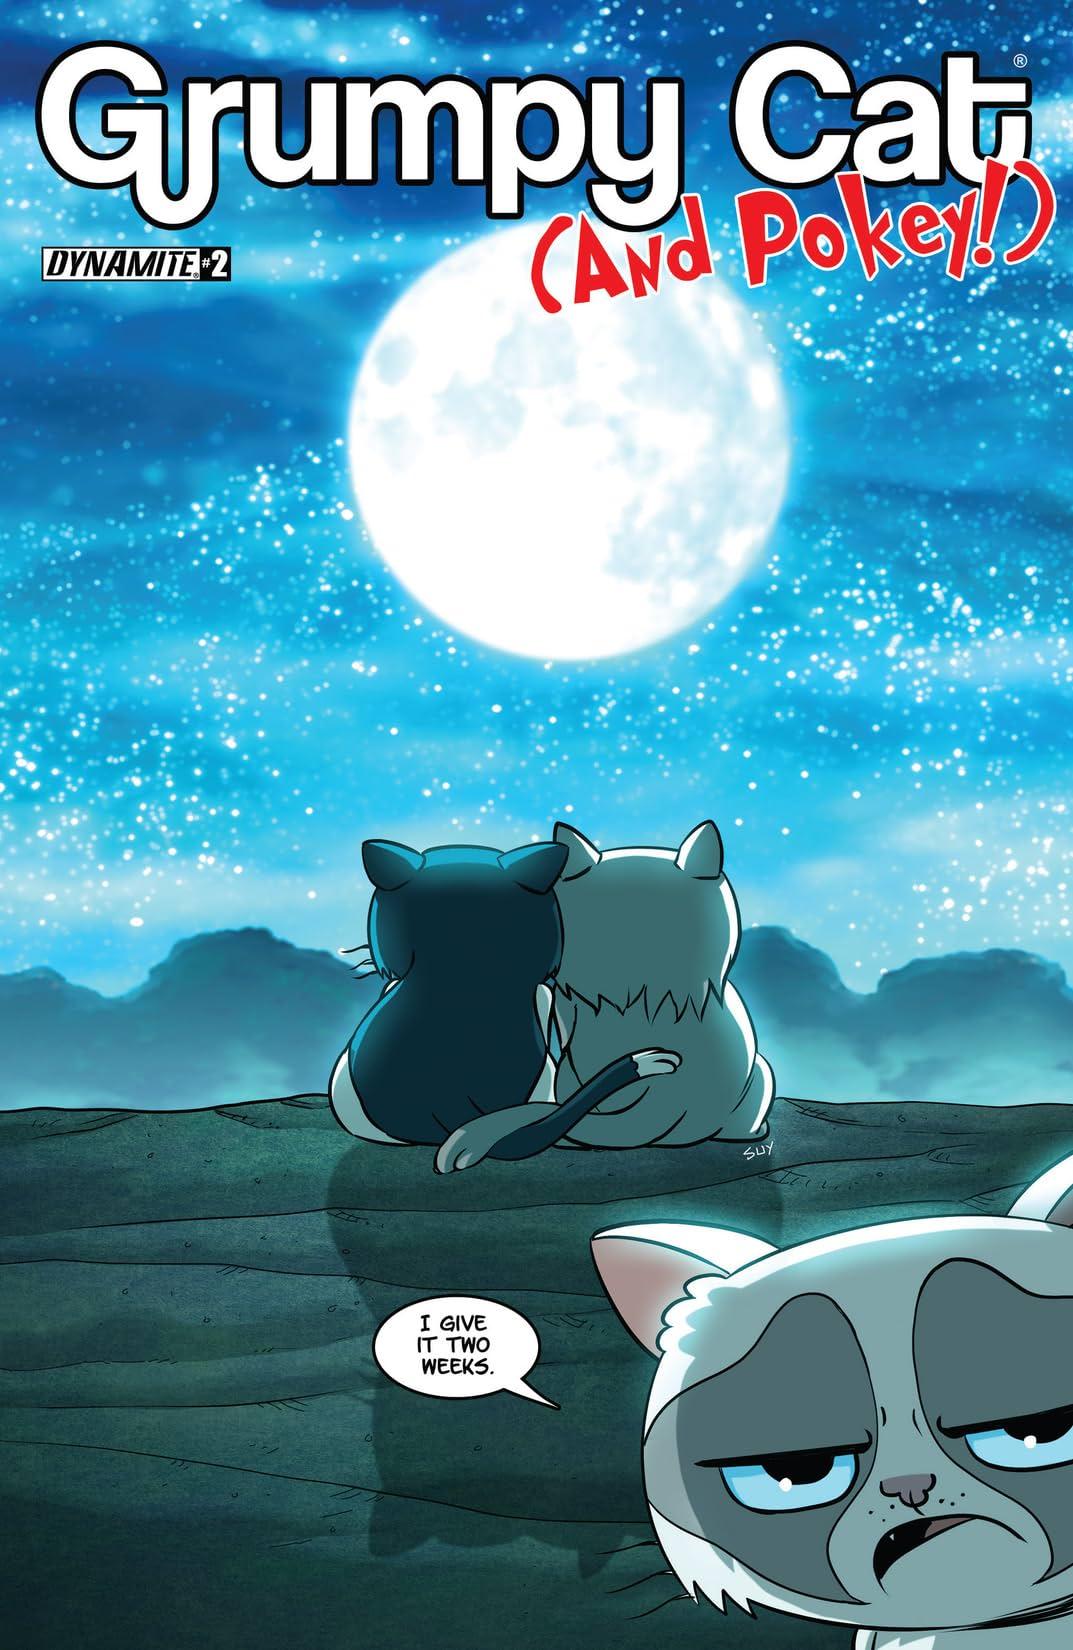 Grumpy Cat And Pokey Vol. 2 #2: Digital Exclusive Edition